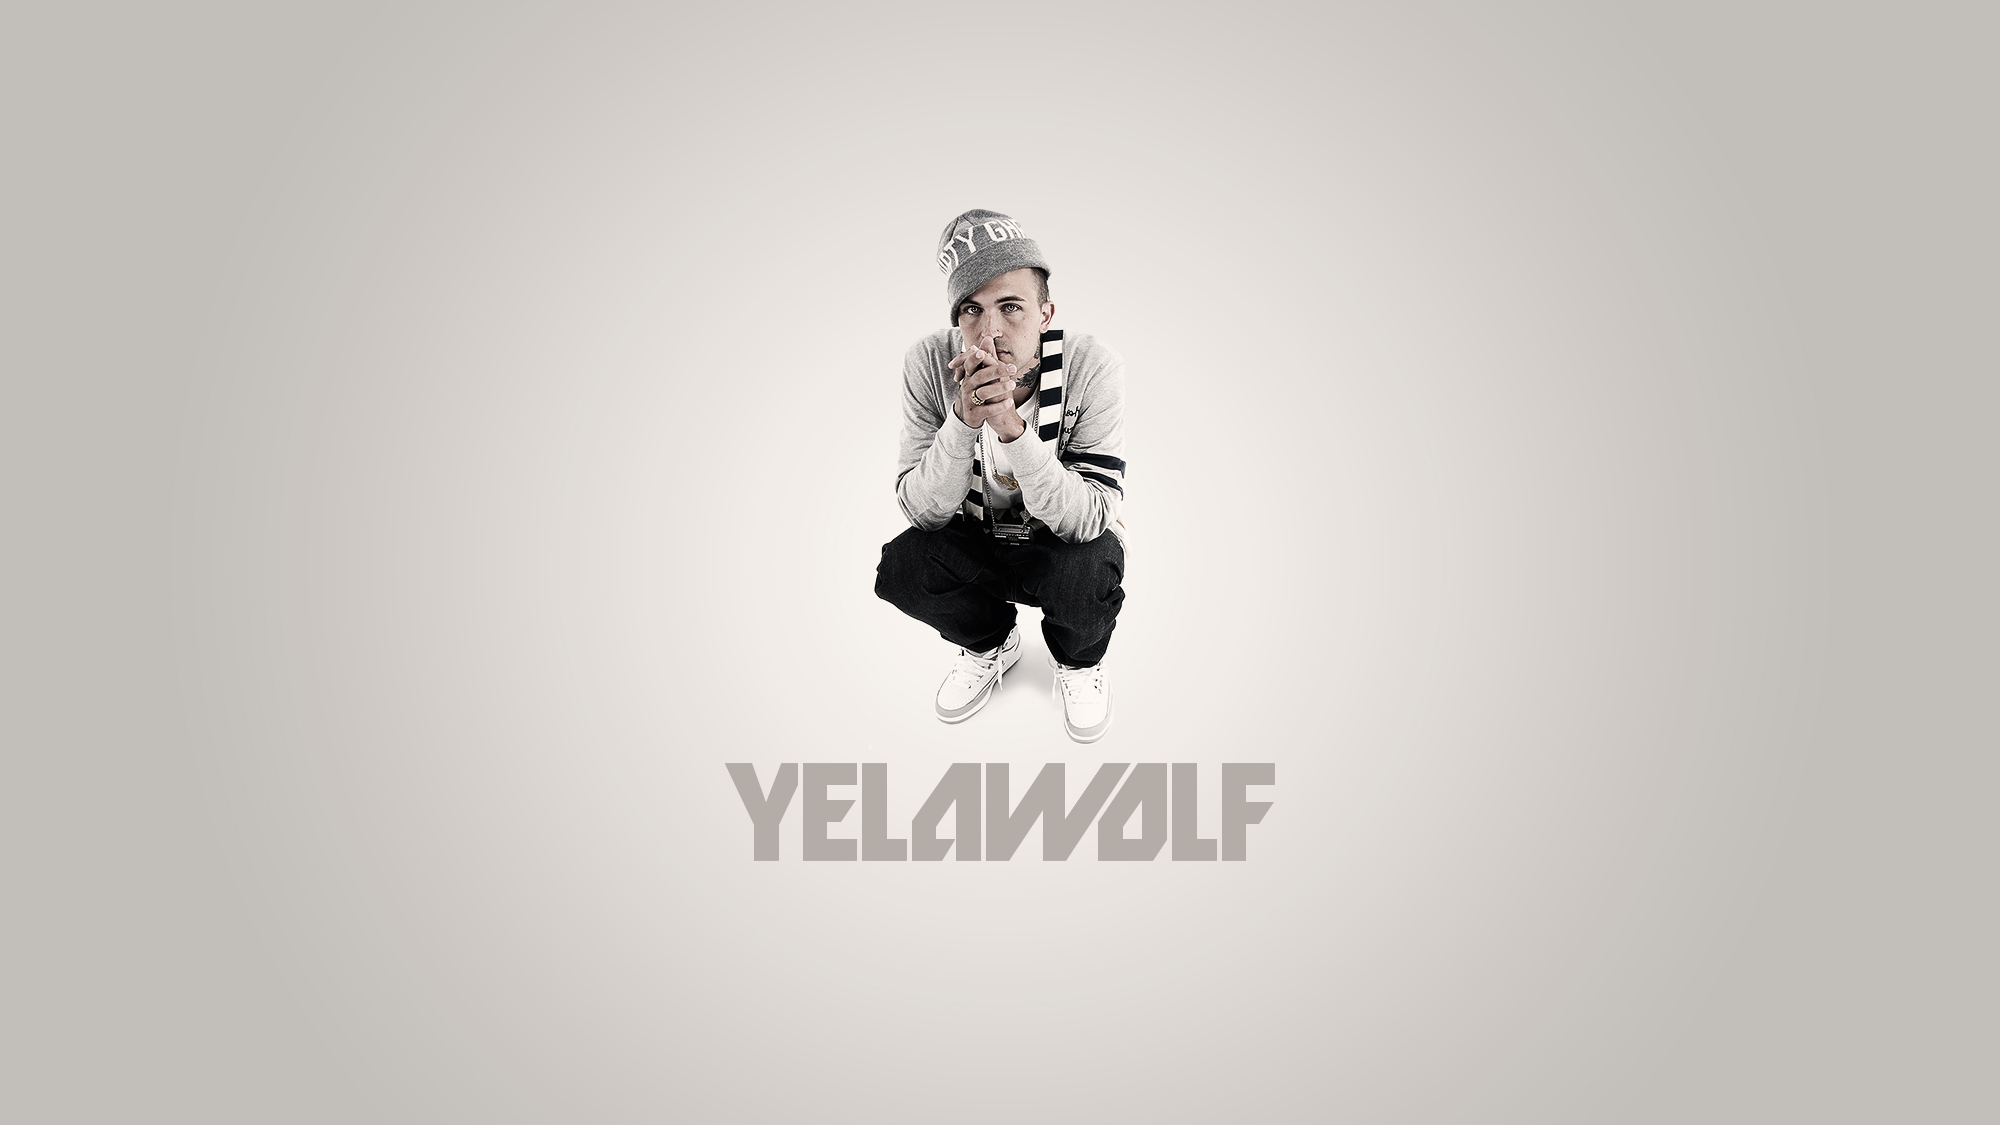 Yelawolf 2013 Wallpaper (1920x1080) by CREEPnCRAWL